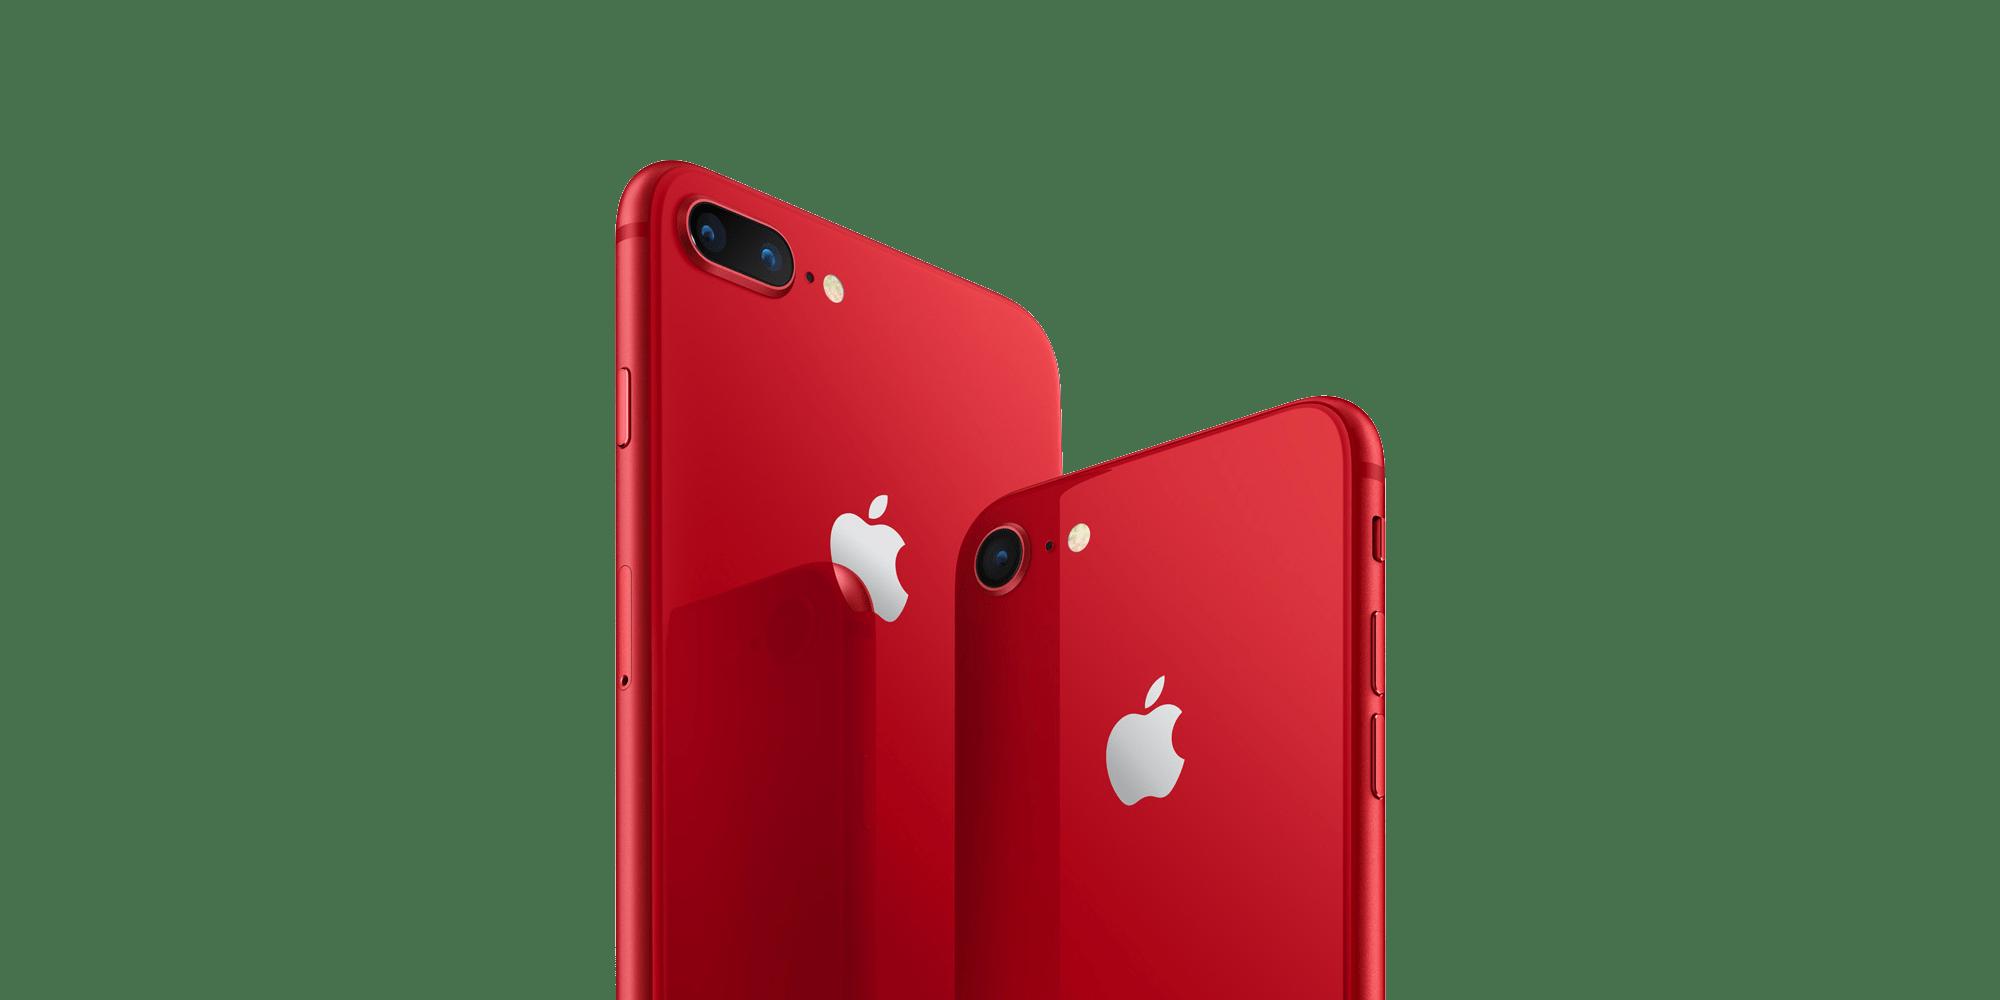 Jual Iphone Murah Garansi Internasional Macberrystore Apple 7 256gb Inter 1 Year International Warranty